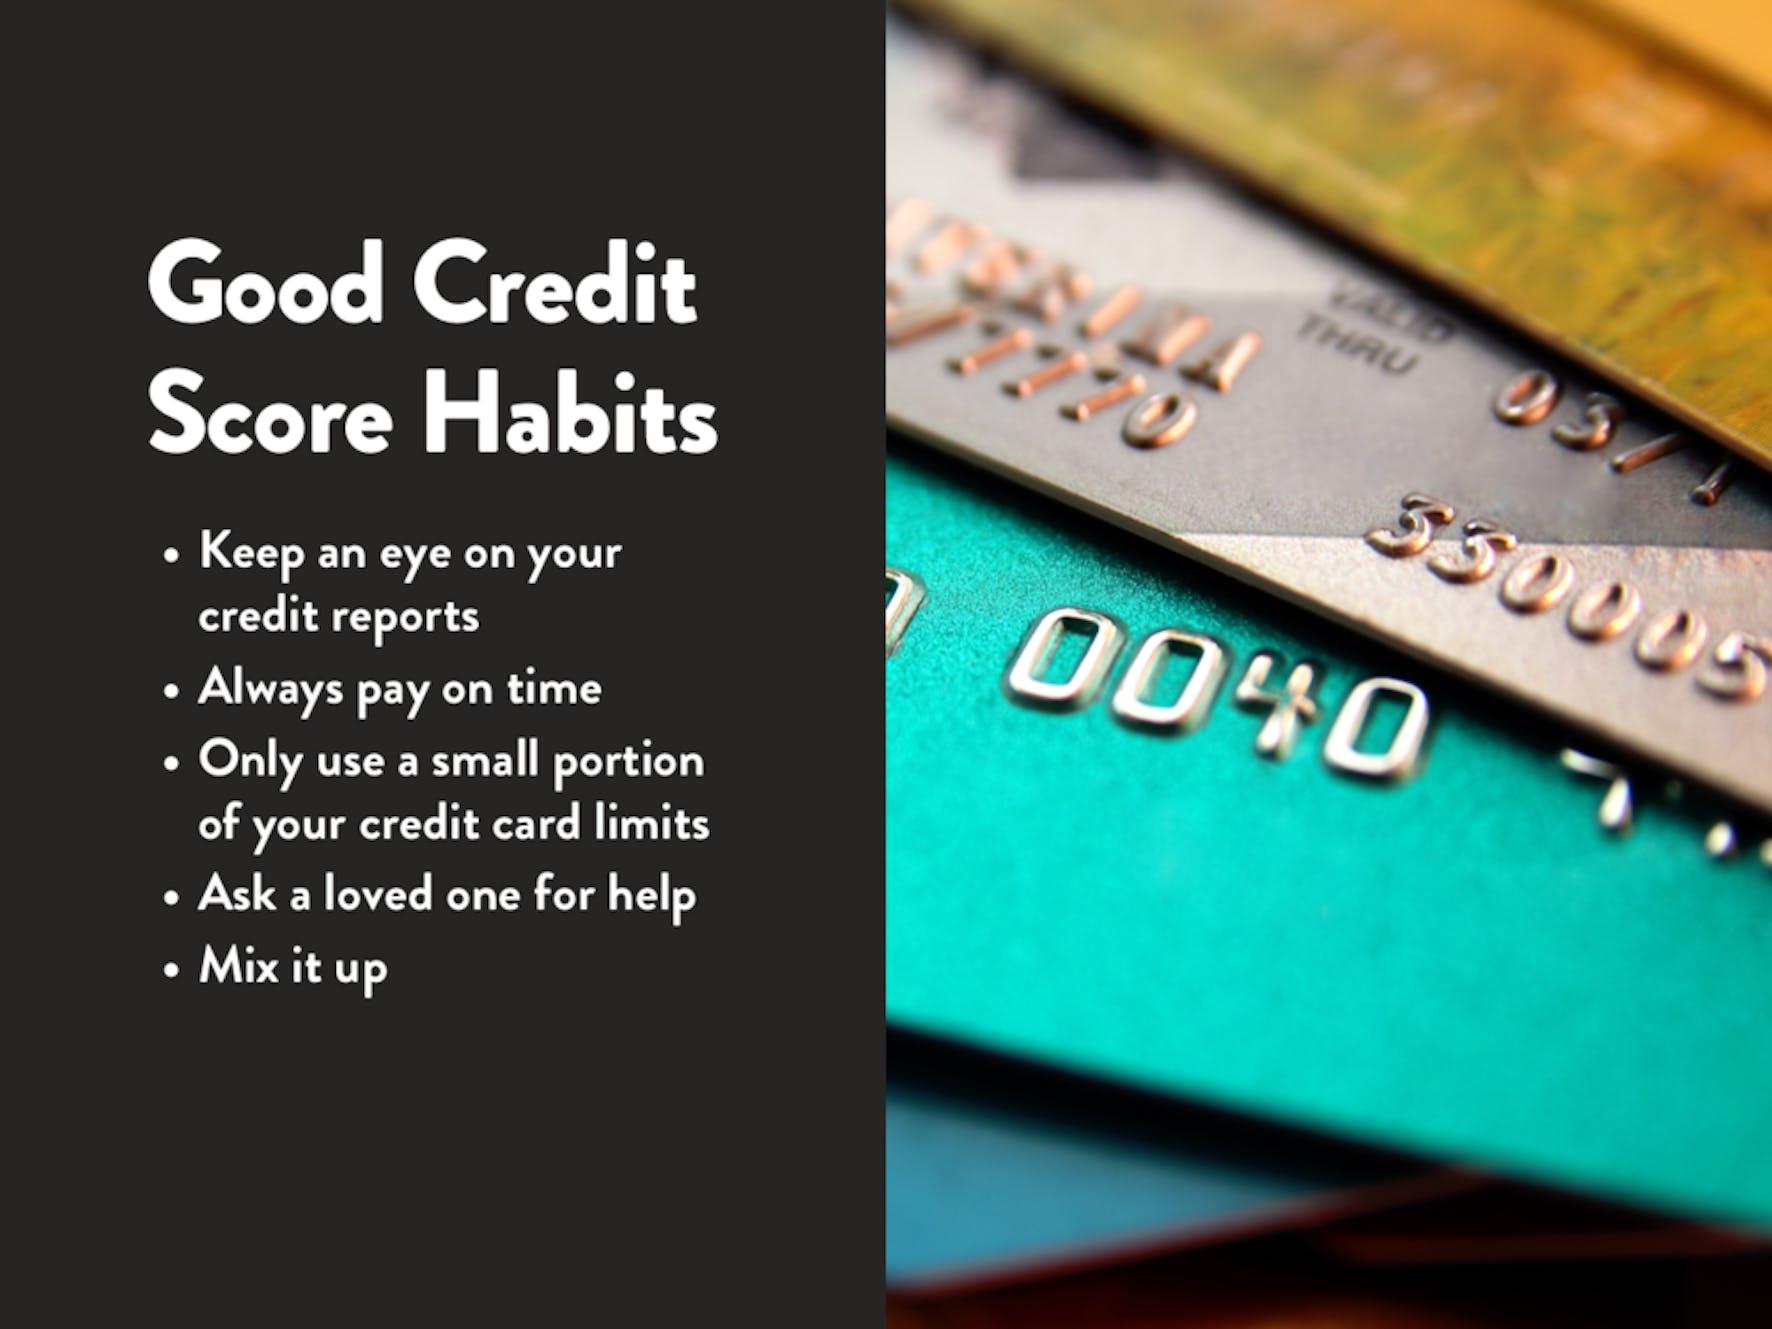 Good Credit Score Habits